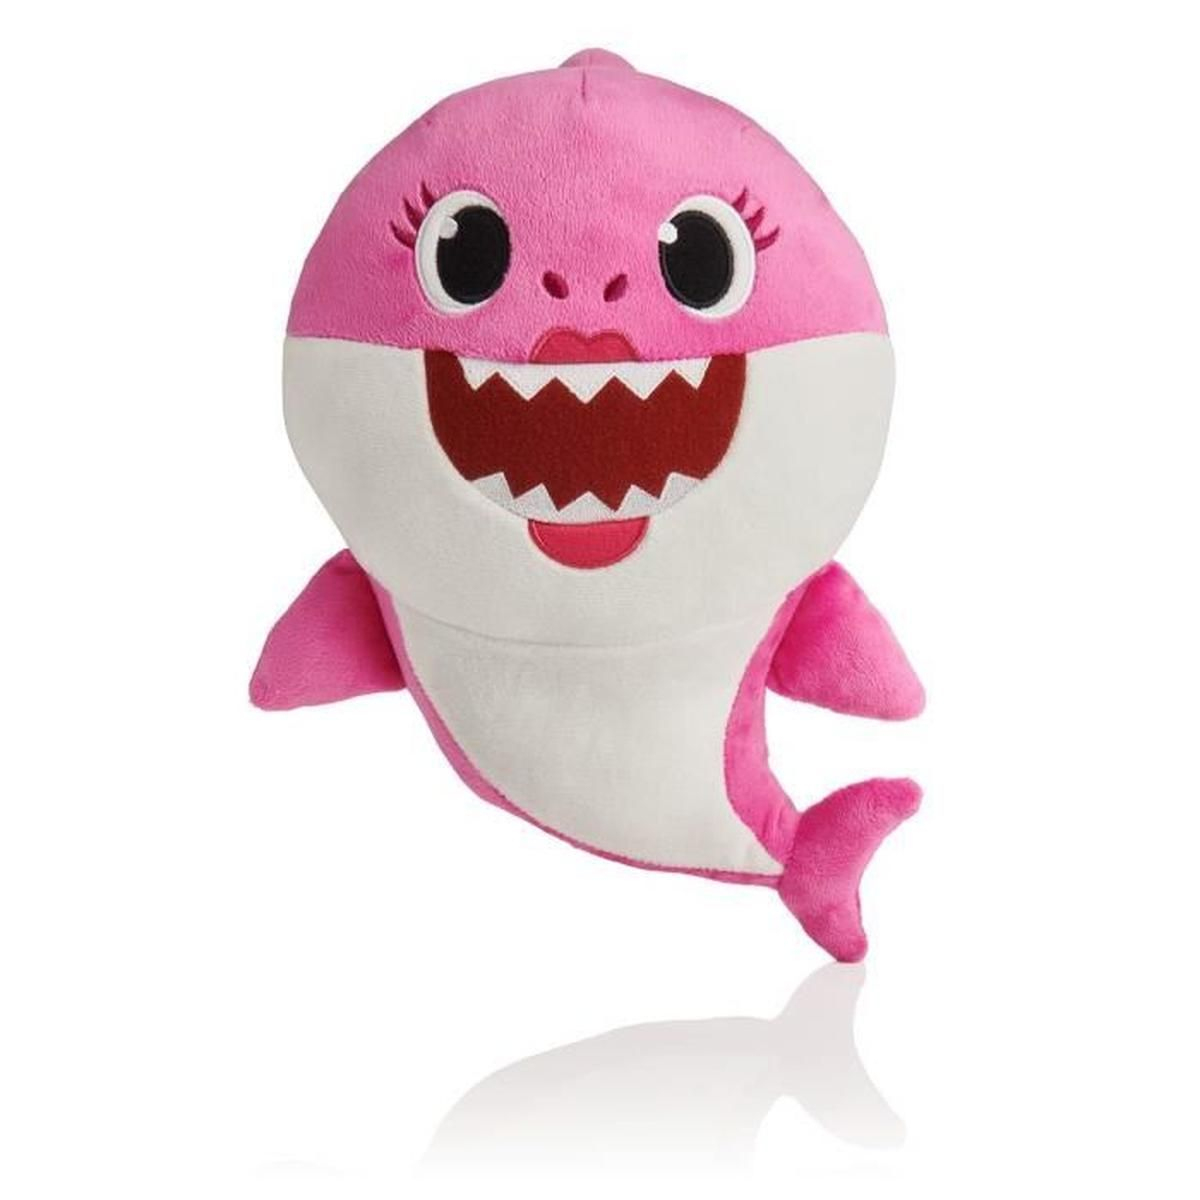 Wow Wee Baby Shark Song Poupée Maman Requin Rose Peluche Douce (Anglais) concernant Jeu De Societe Requin